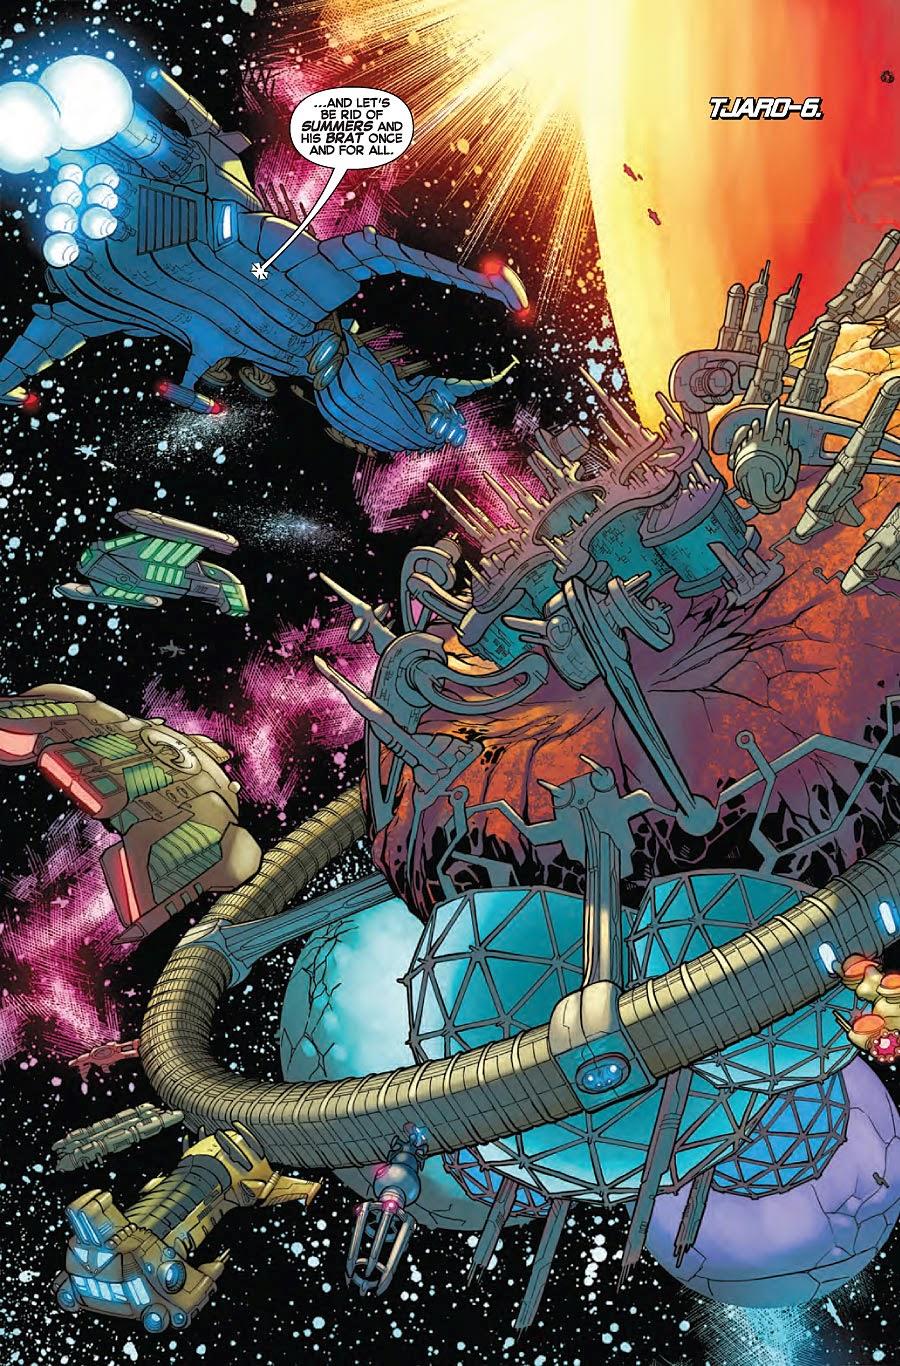 Tjaro-6 the slave planet